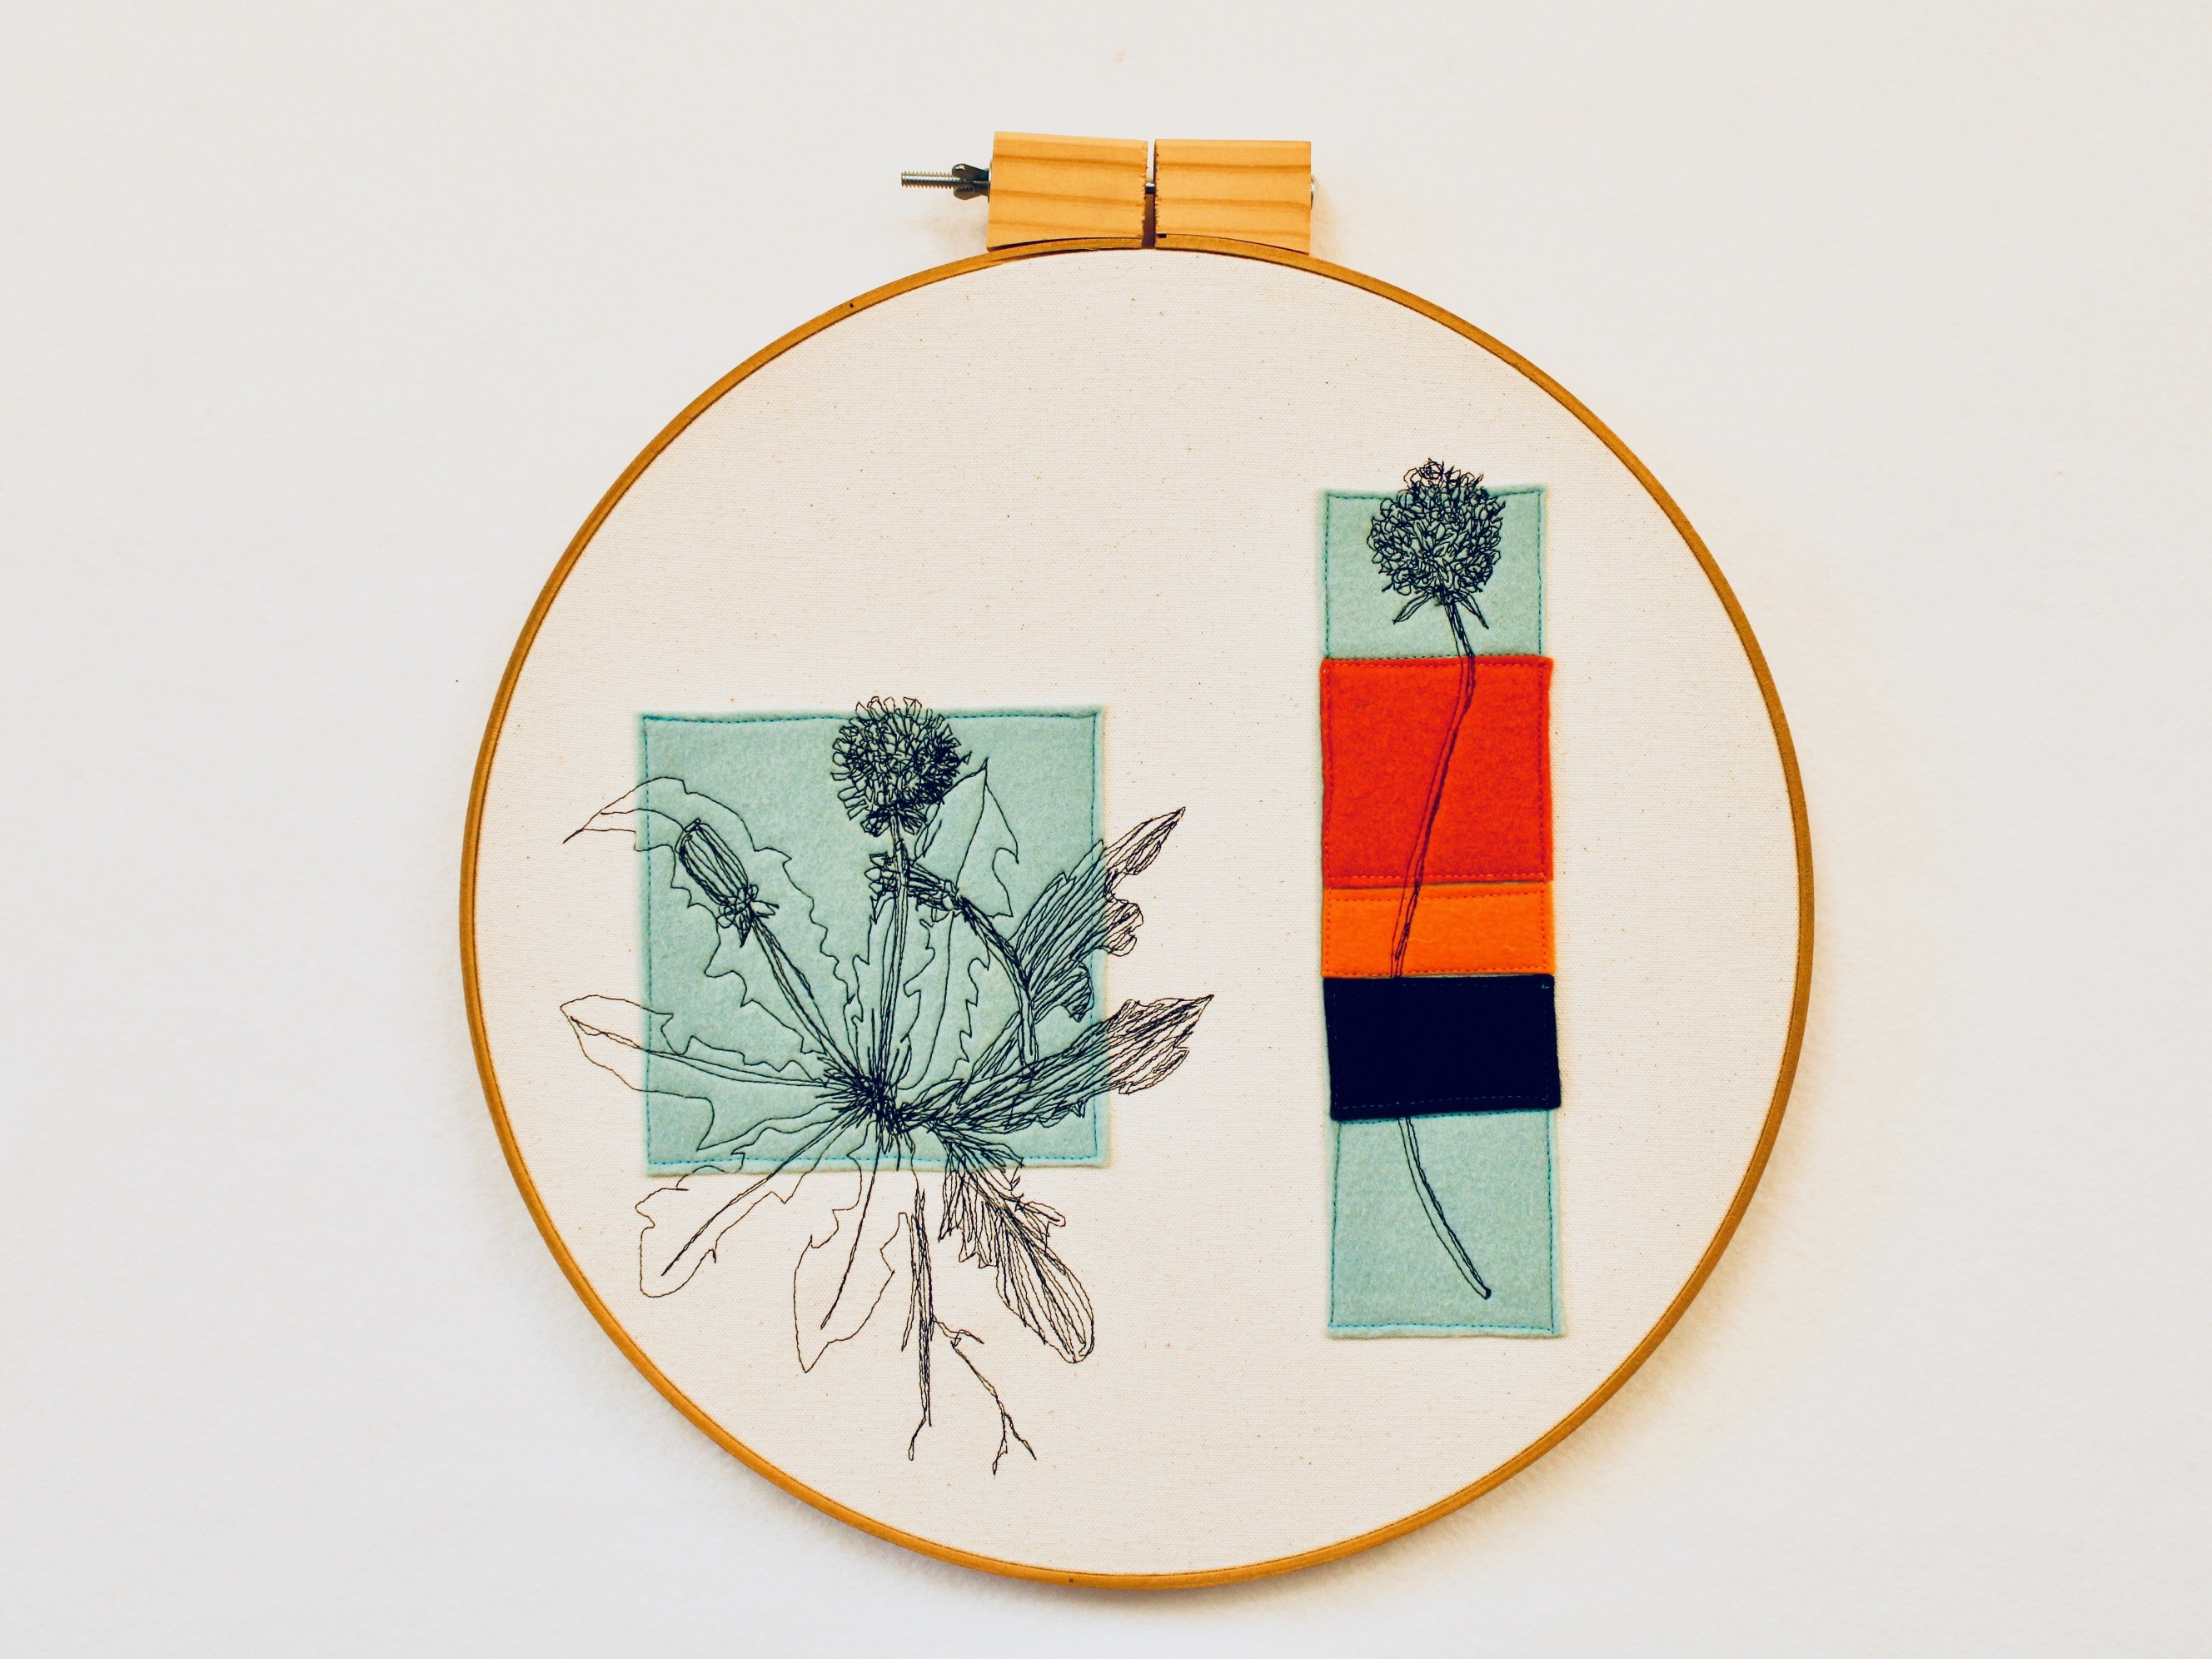 Freehand machined embroidered, clover, dandelion, felt applique, felt, illustration, edible plants, pillow, canvas,